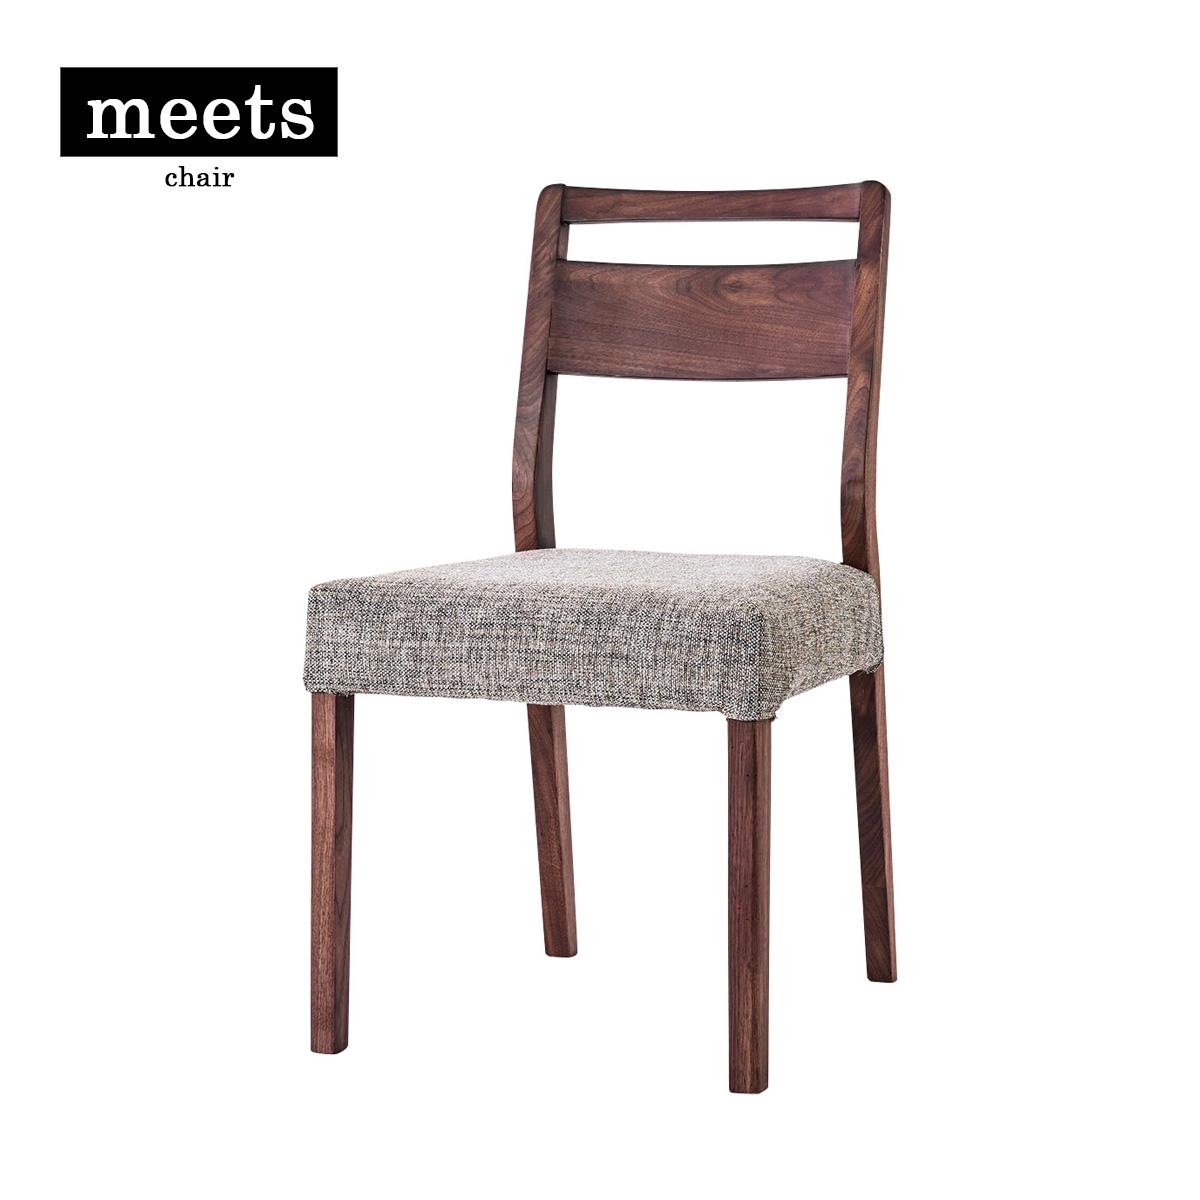 meets chair ミーツ チェアwalnut brown ウォールナット ブラウン ダイニングチェア moderato3